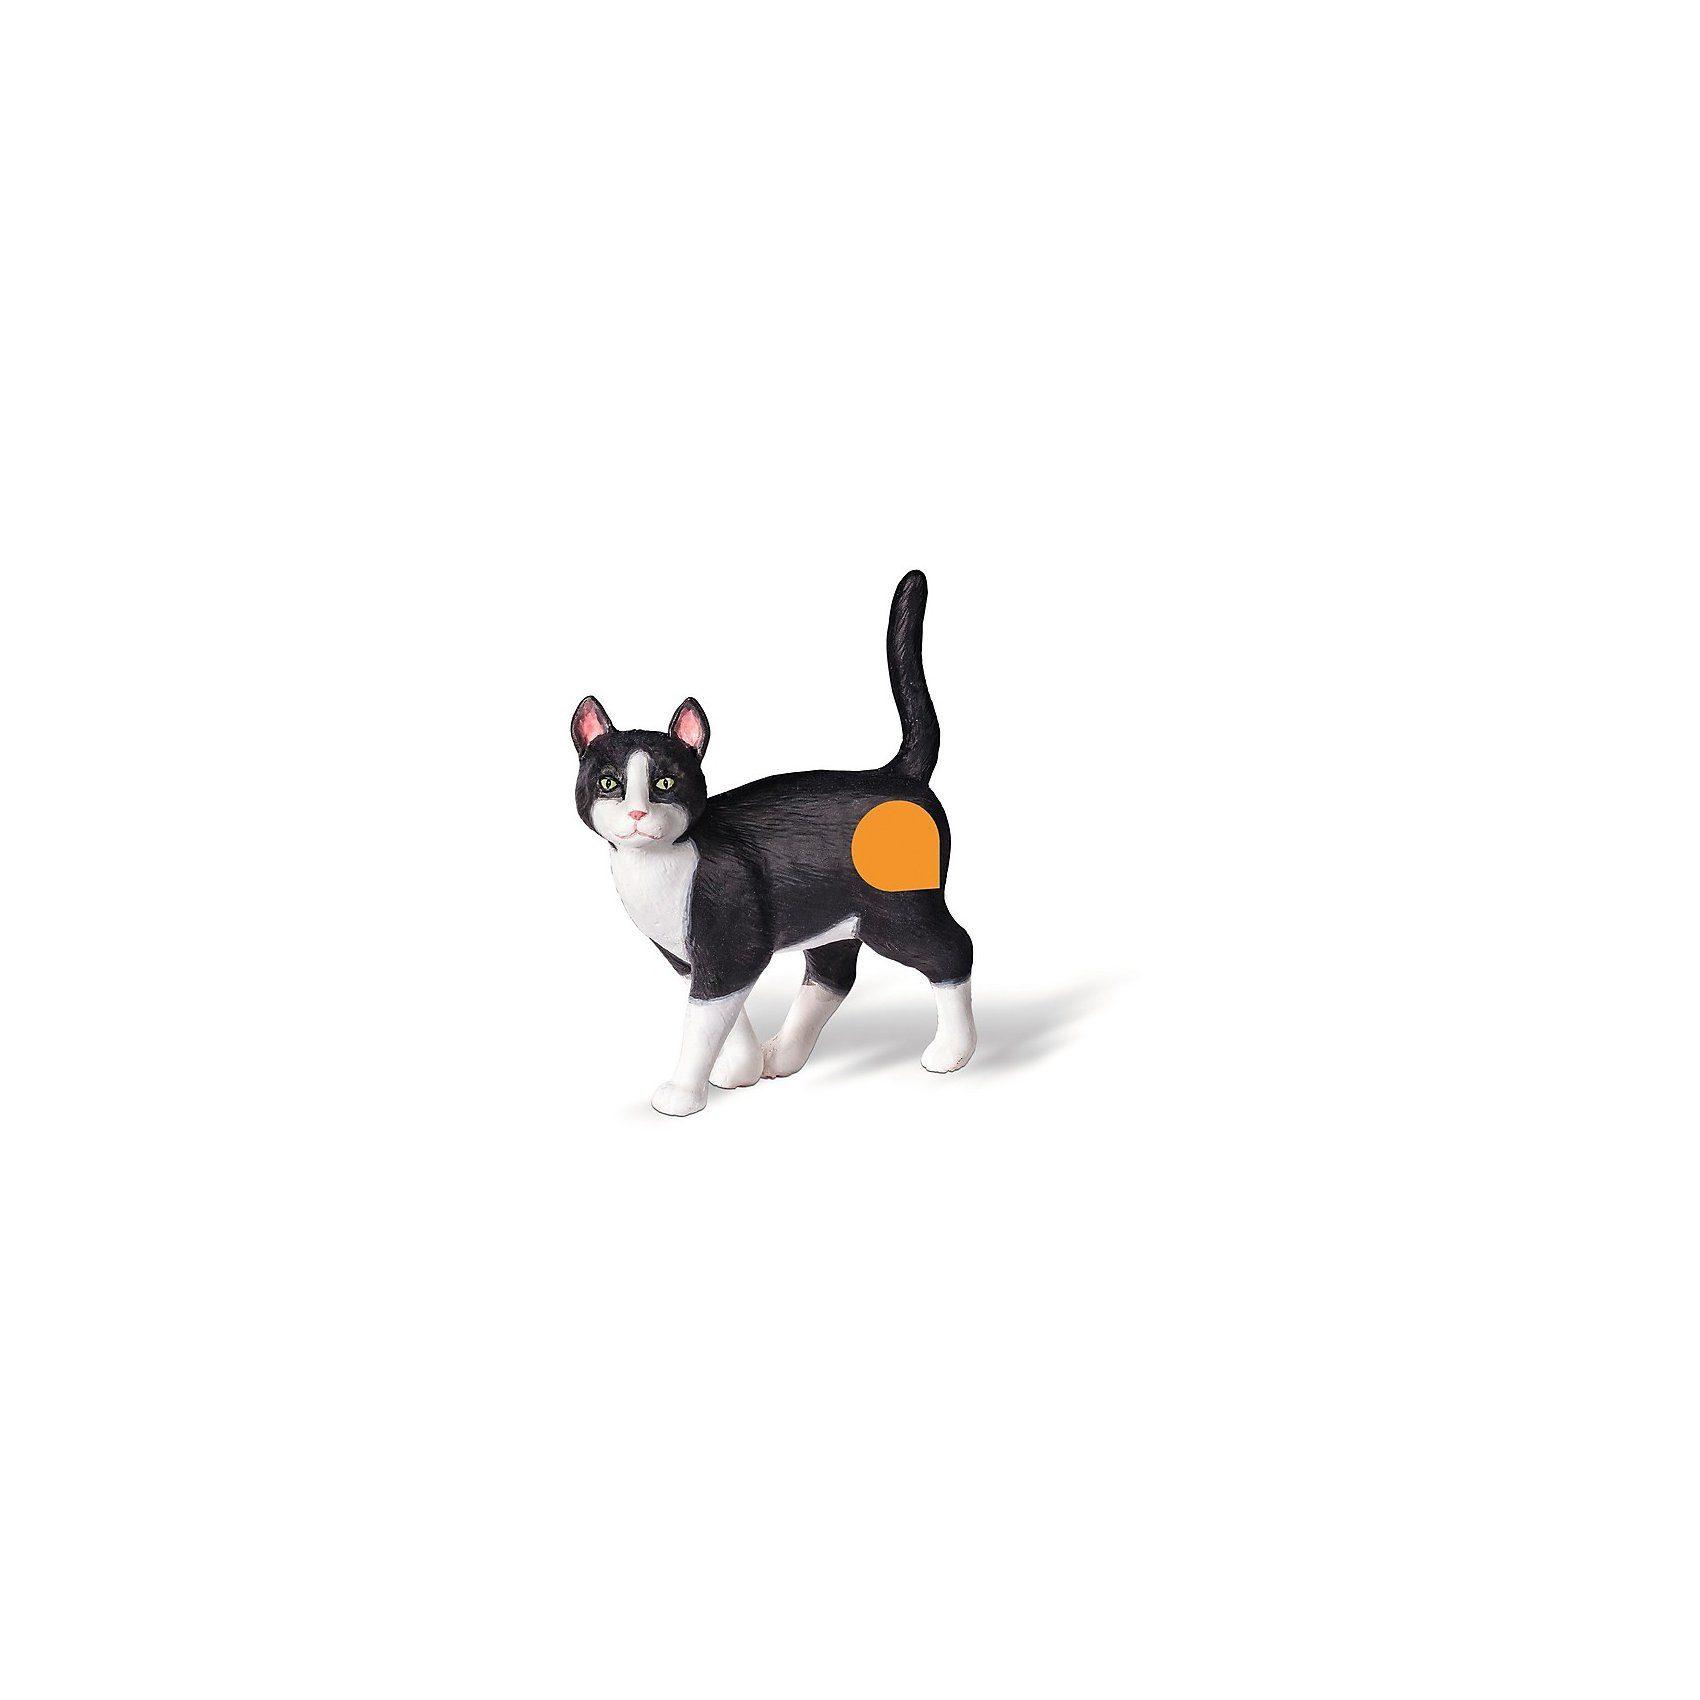 Ravensburger tiptoi® Spielfigur Katze